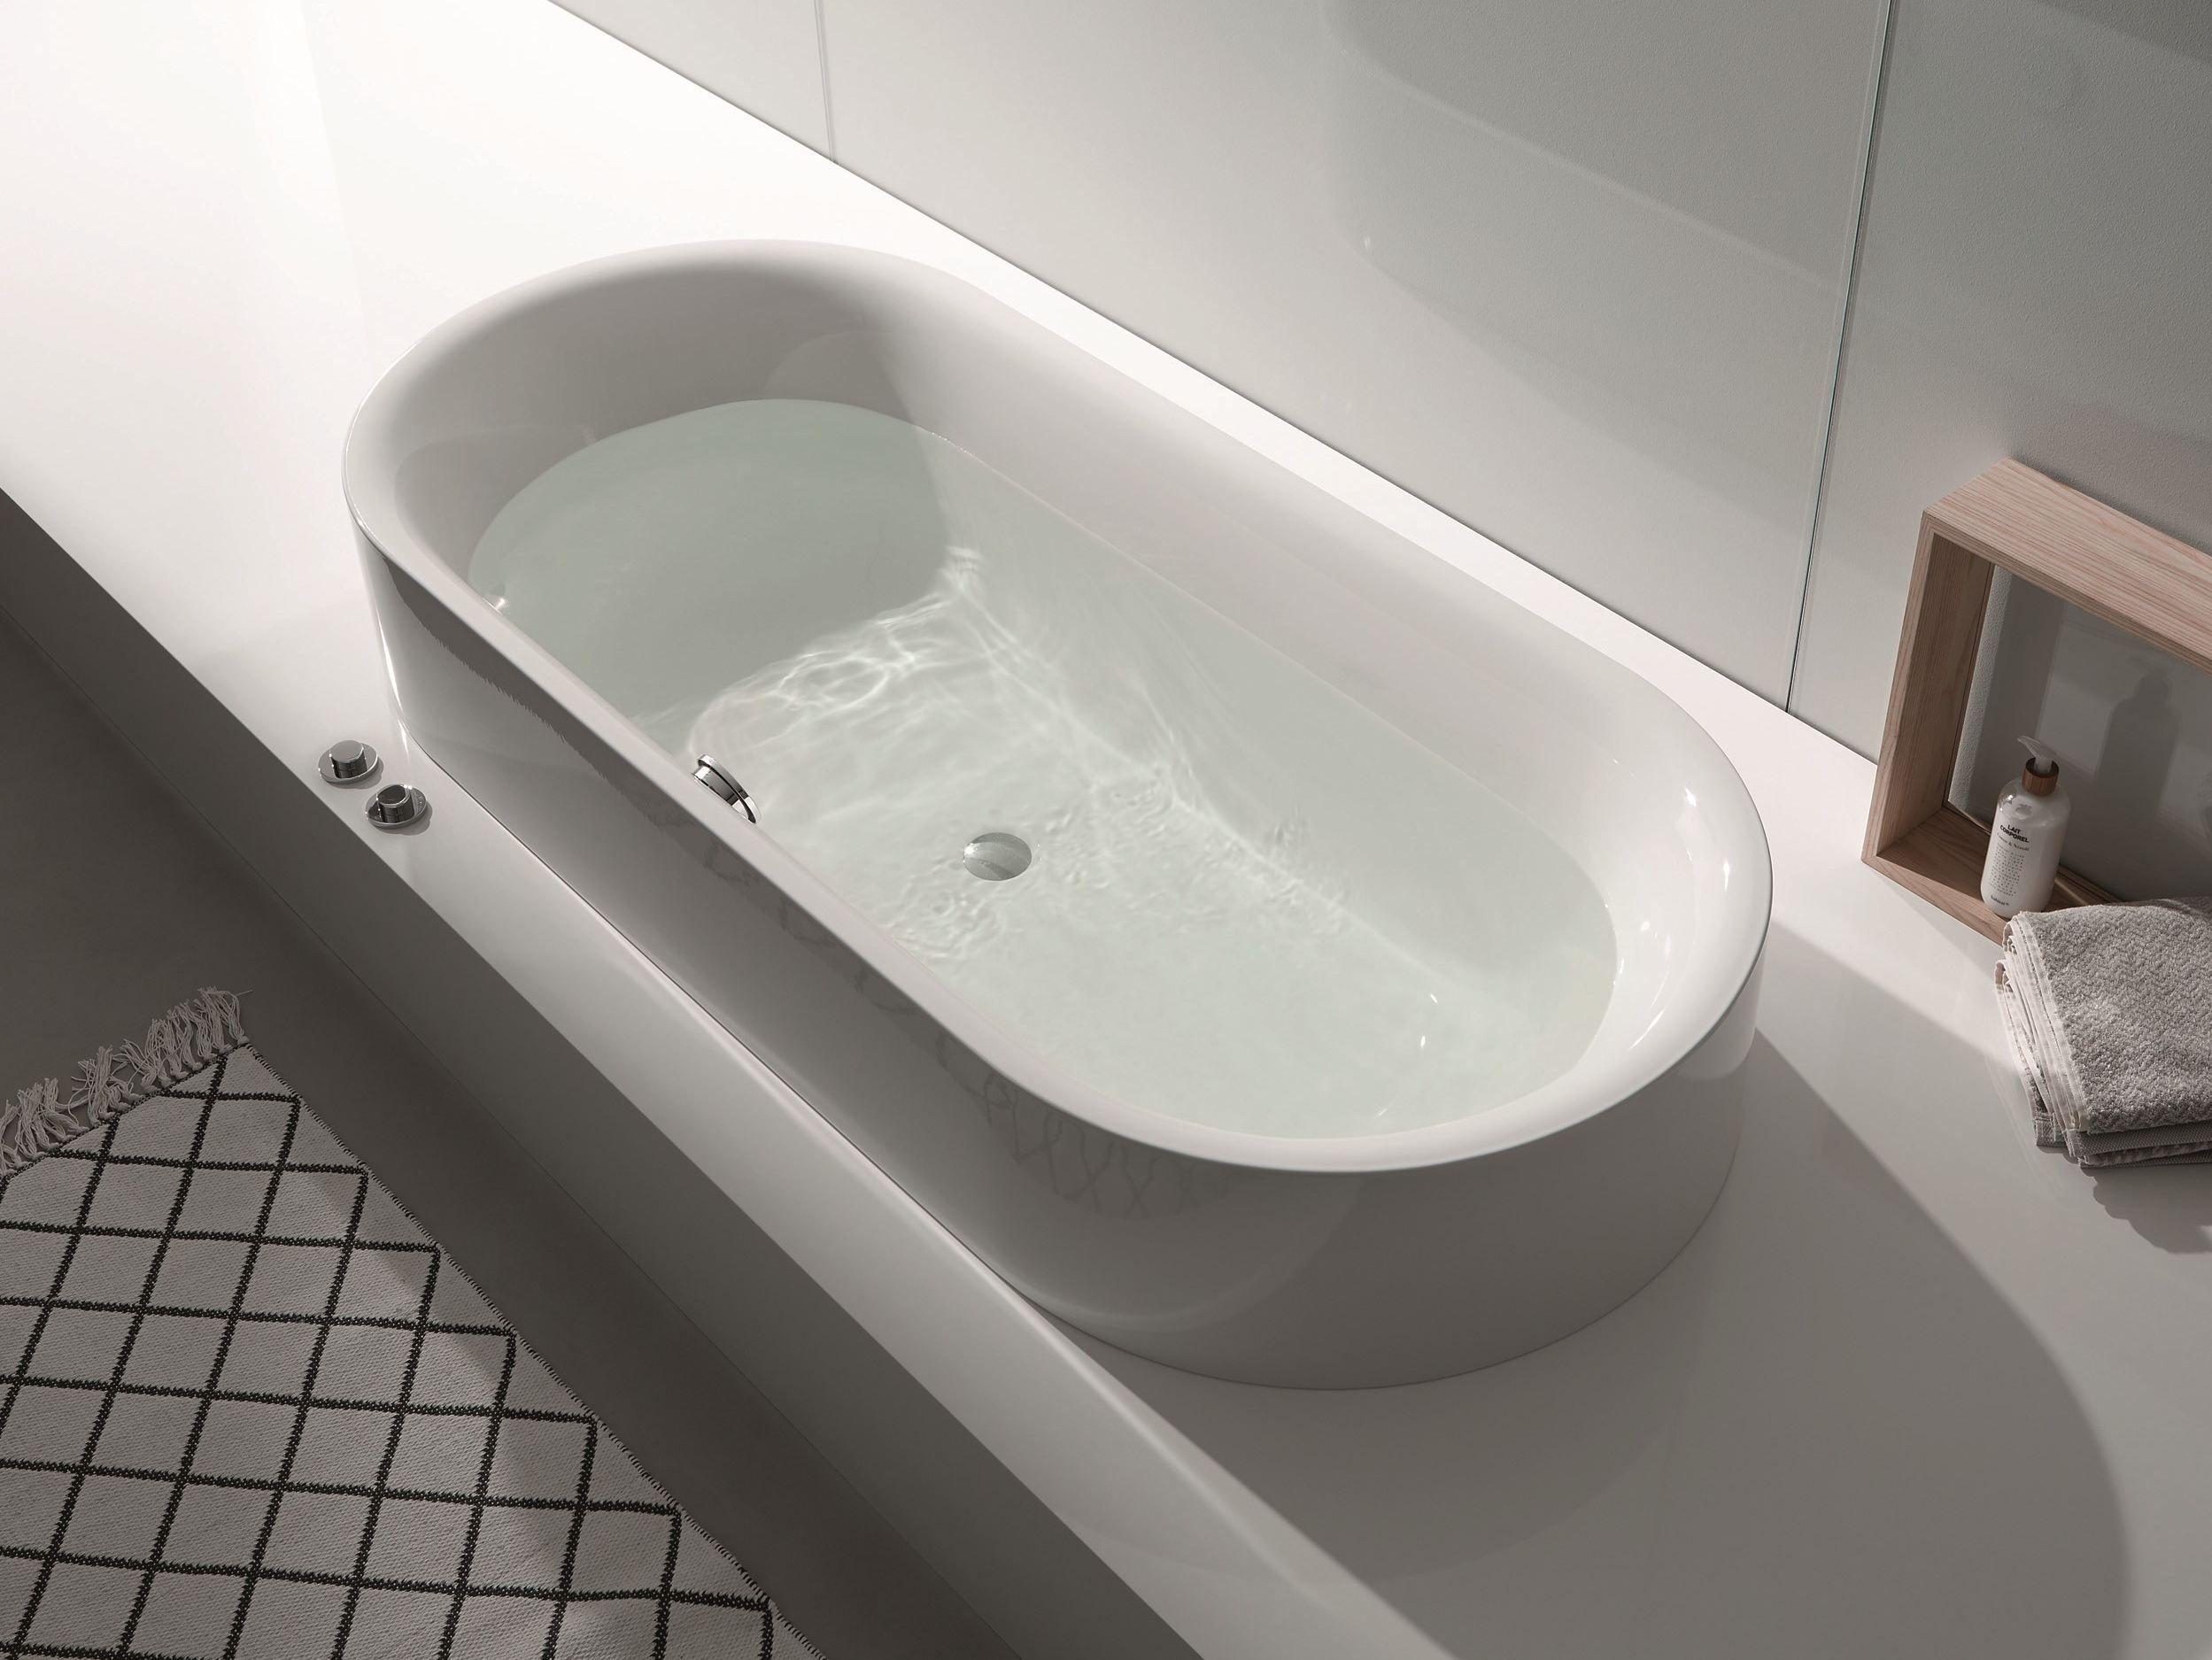 baignoire semi encastr e ovale bettelux oval highline by. Black Bedroom Furniture Sets. Home Design Ideas